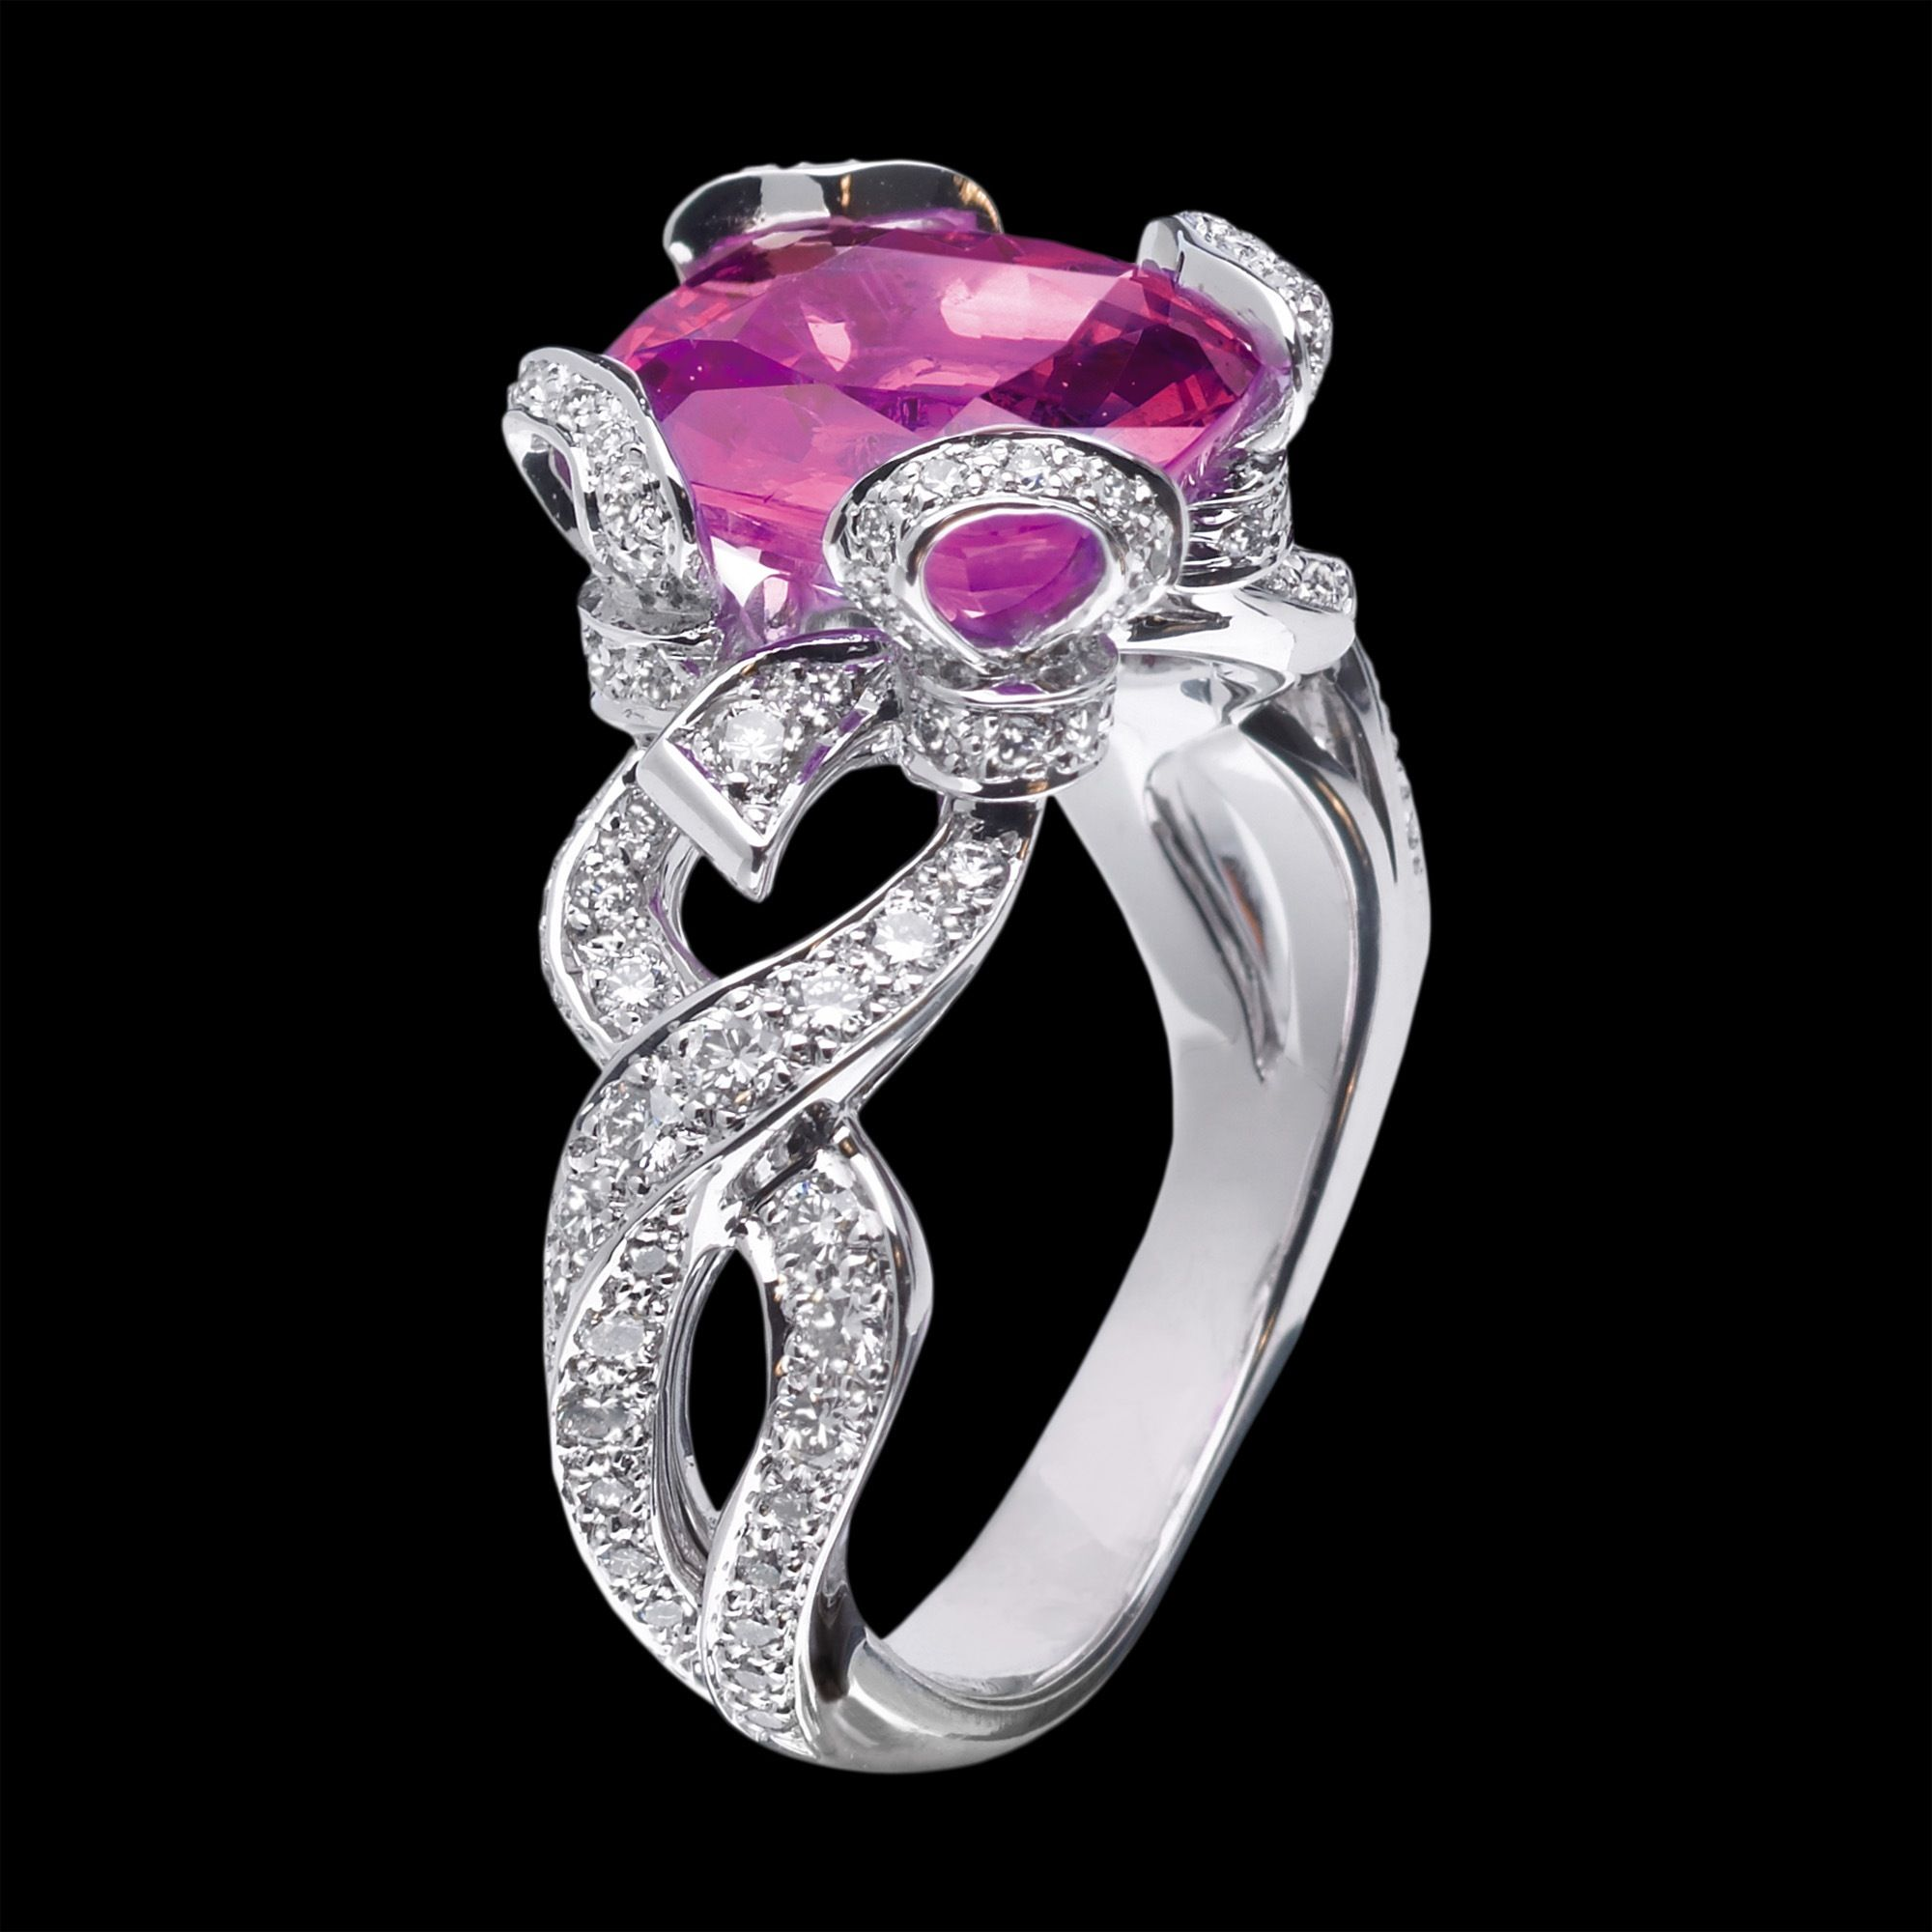 Dior Modern   Dior jewelry. Jewelry collection. Fine jewelry